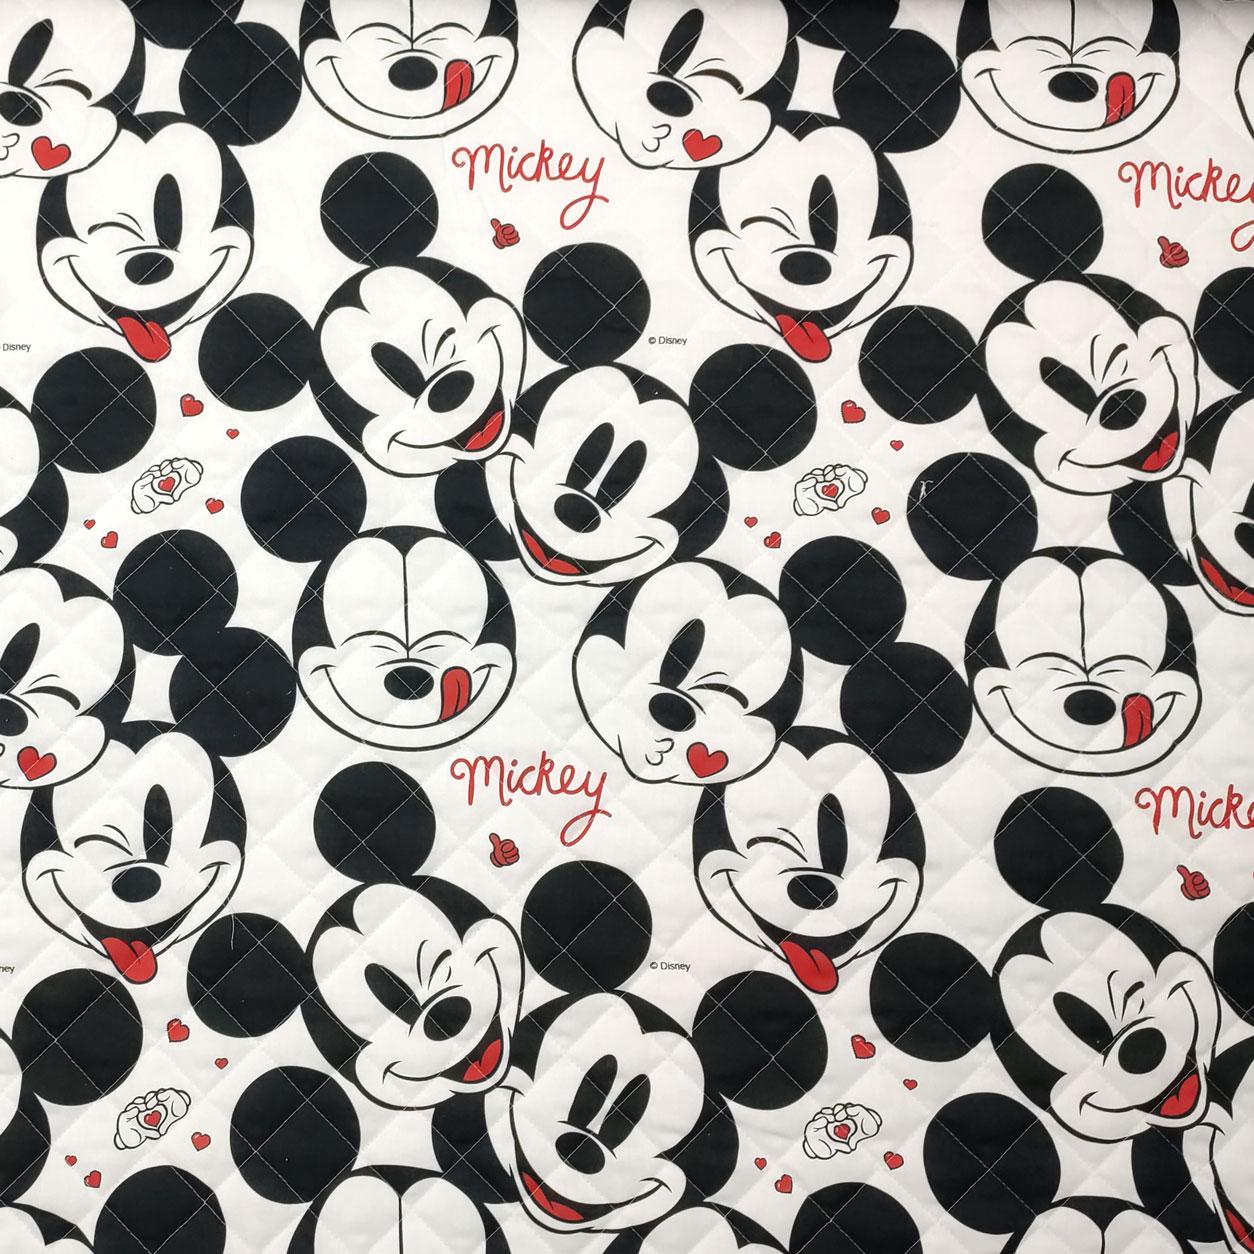 Trapunta Faccine Mickey Mouse Bianco